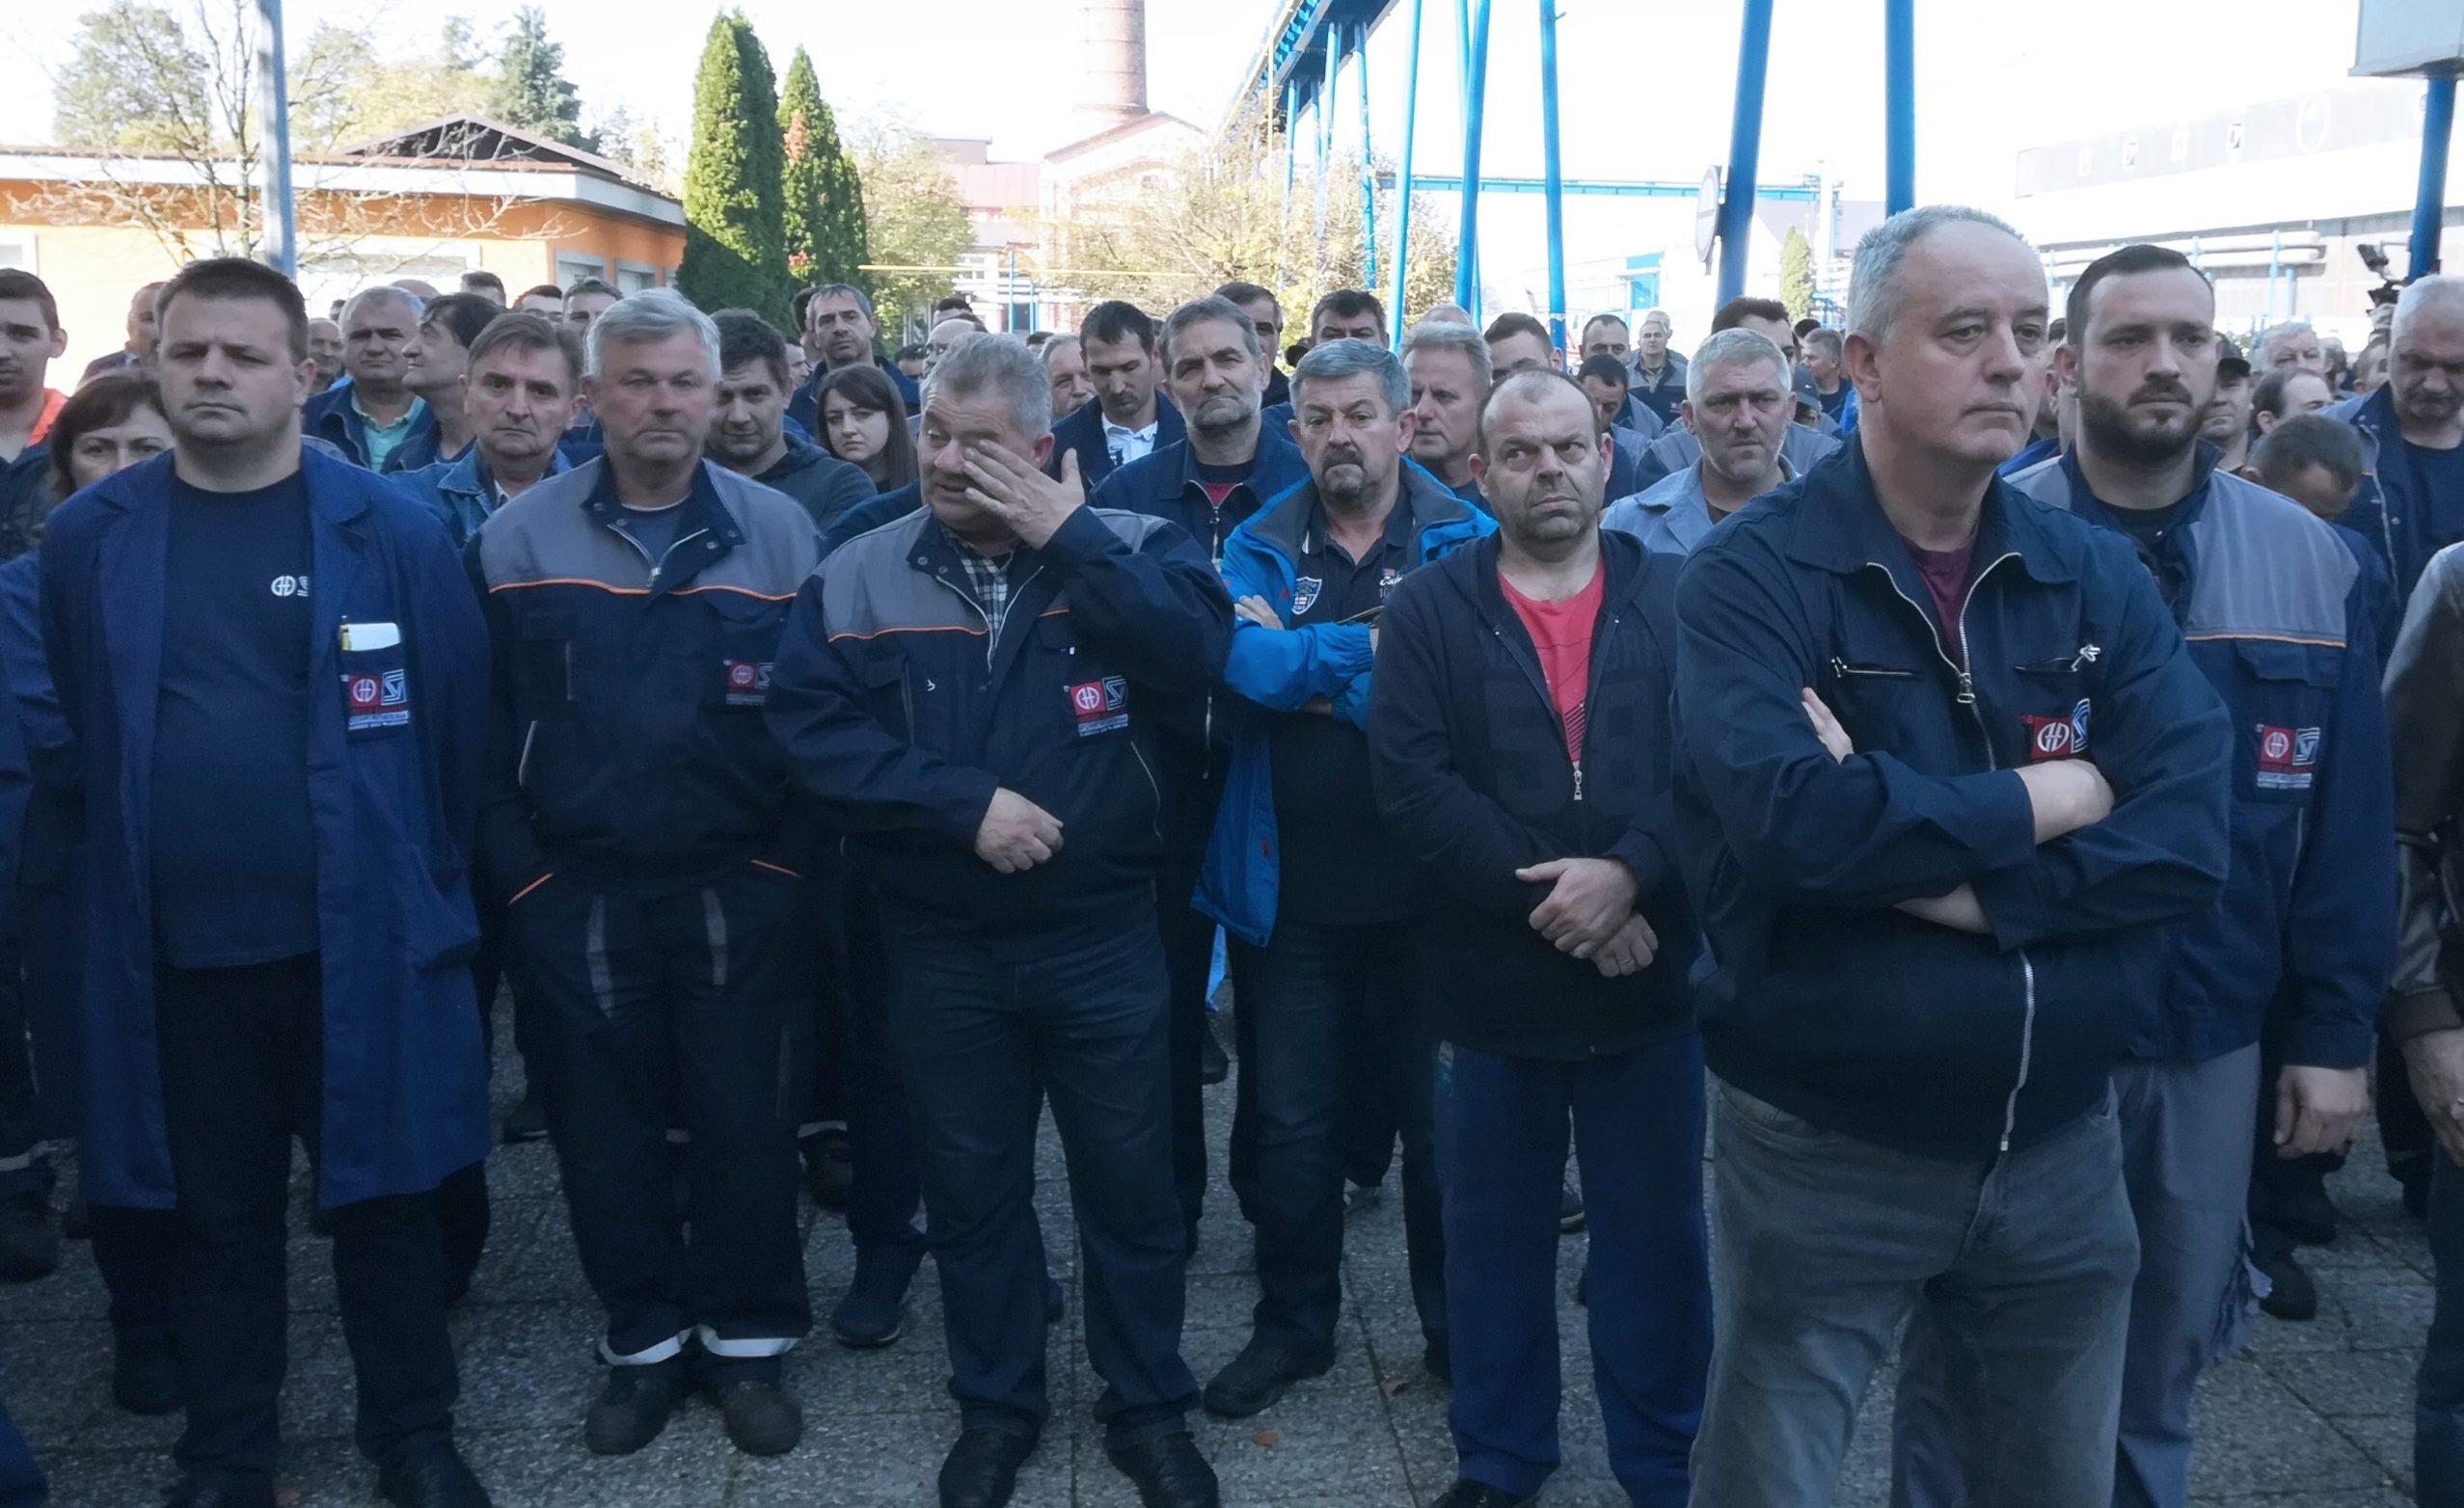 Štrajk oko 700 radnika tri tvrtke grupacije Đuro Đakovic, Specijalna vozila, Industrijska postrojenja